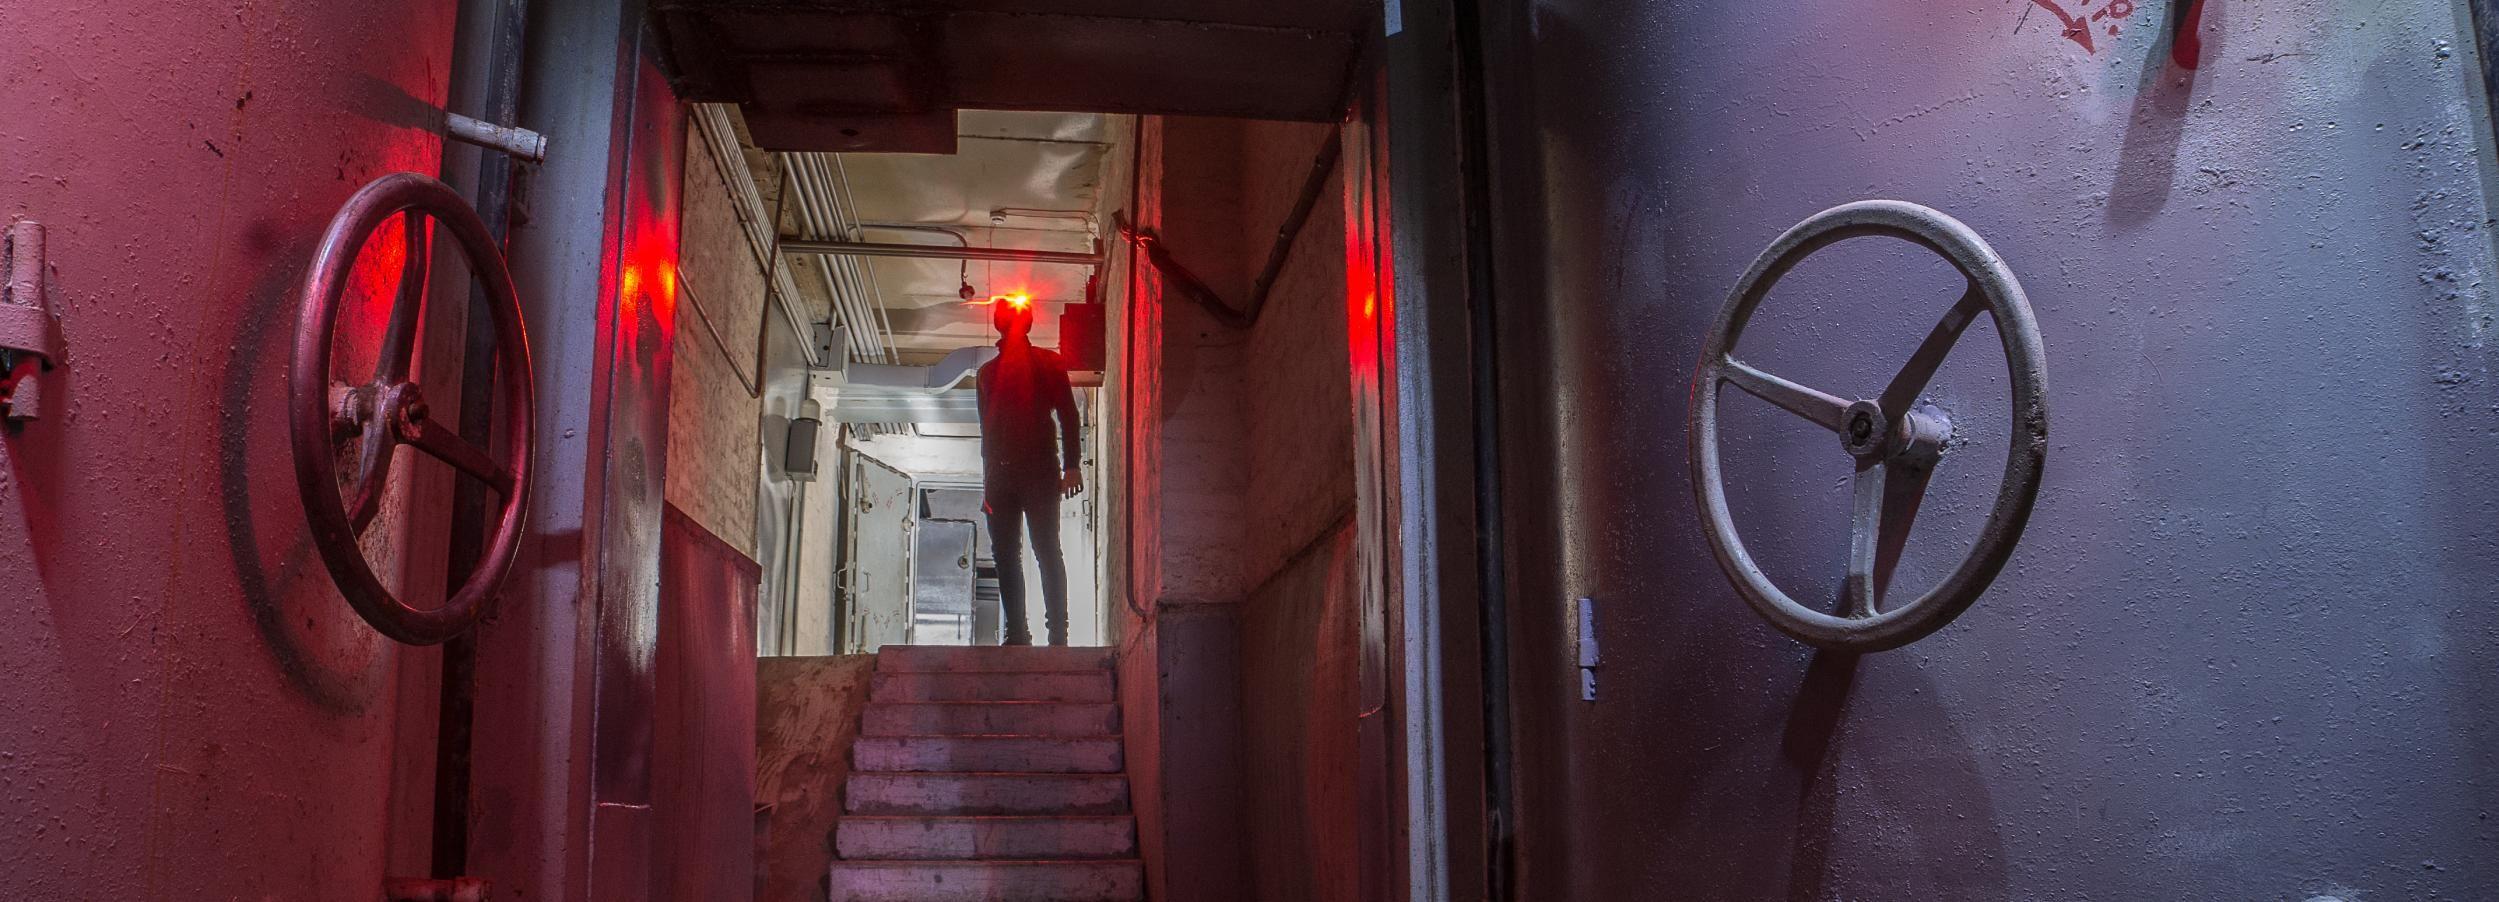 Kiev: Urbex Underground and Bunker Tour